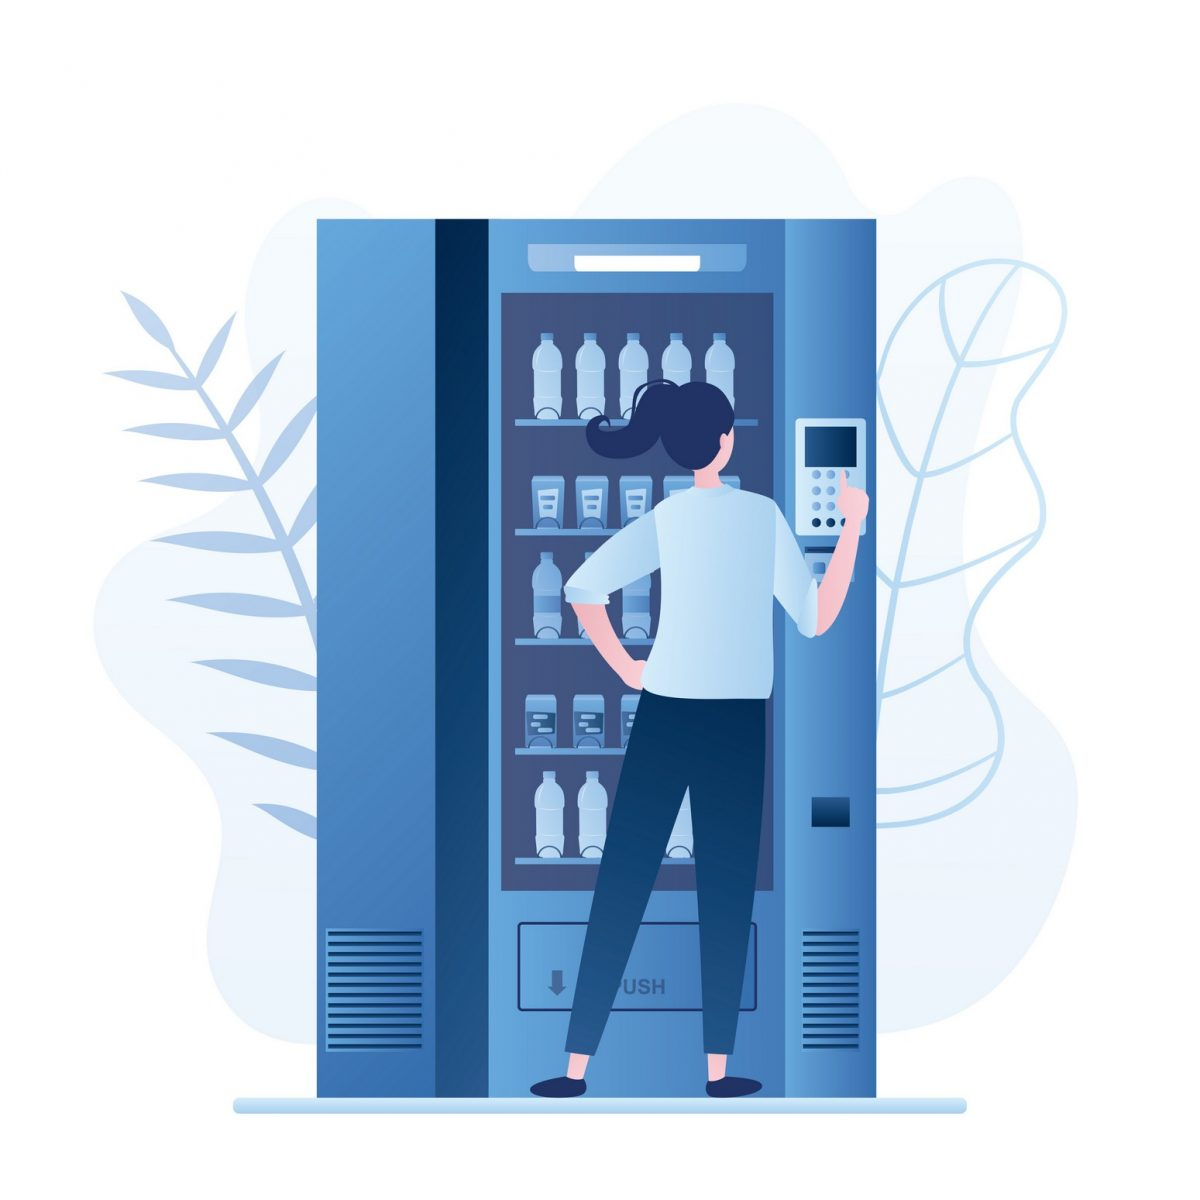 Tucson Vending Machines | Cutting-Edge Technology | Green Break Room Services